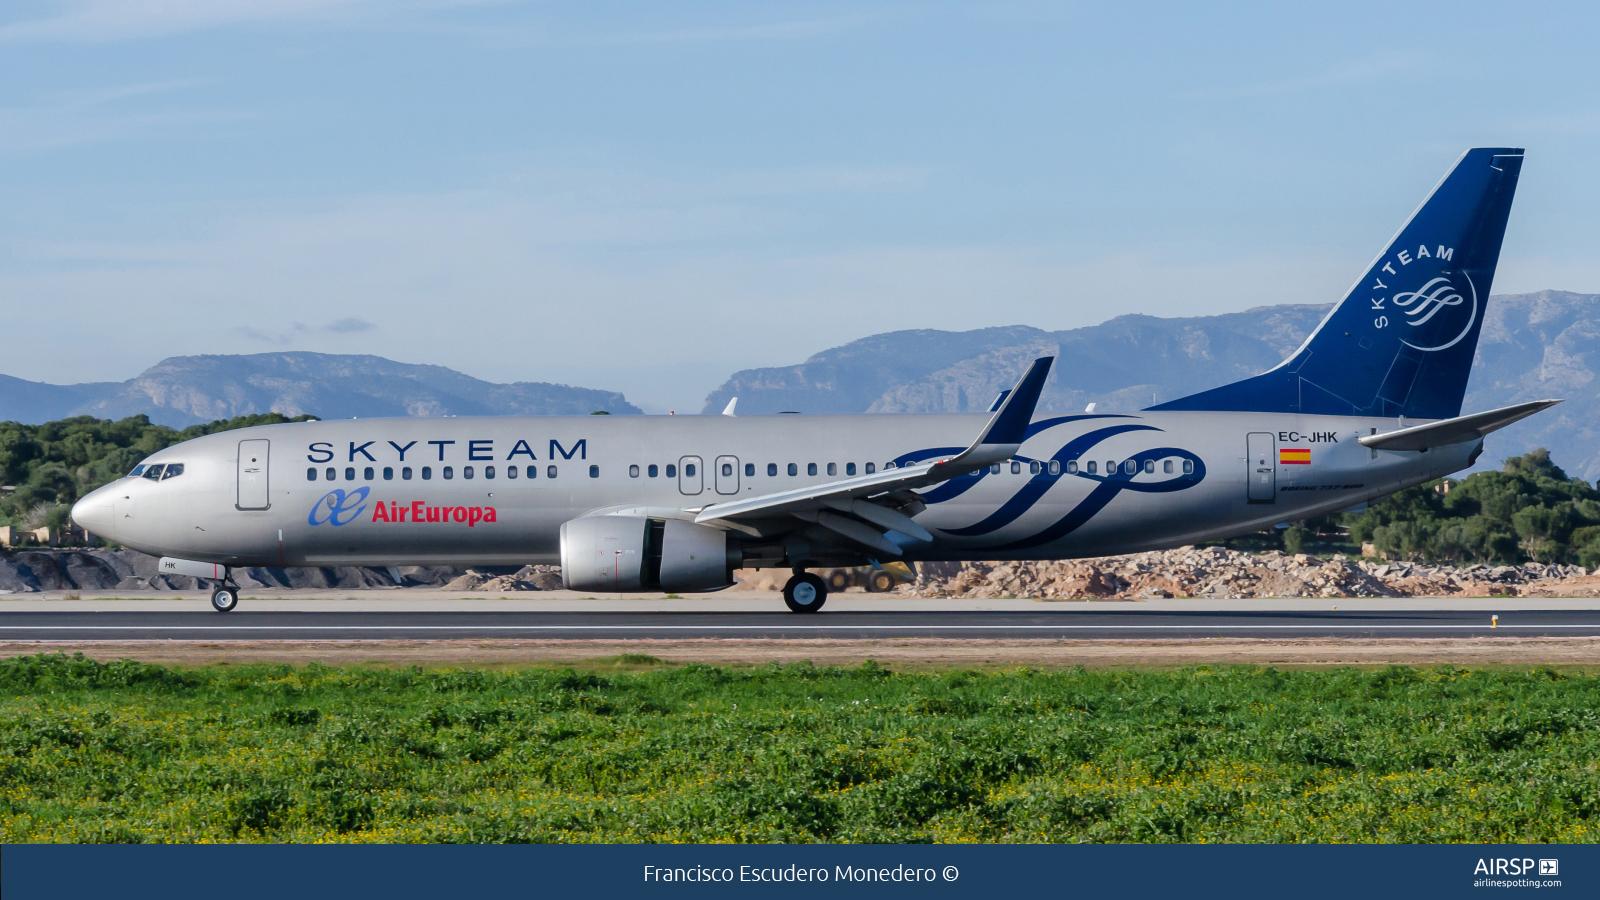 Air EuropaBoeing 737-800EC-JHK